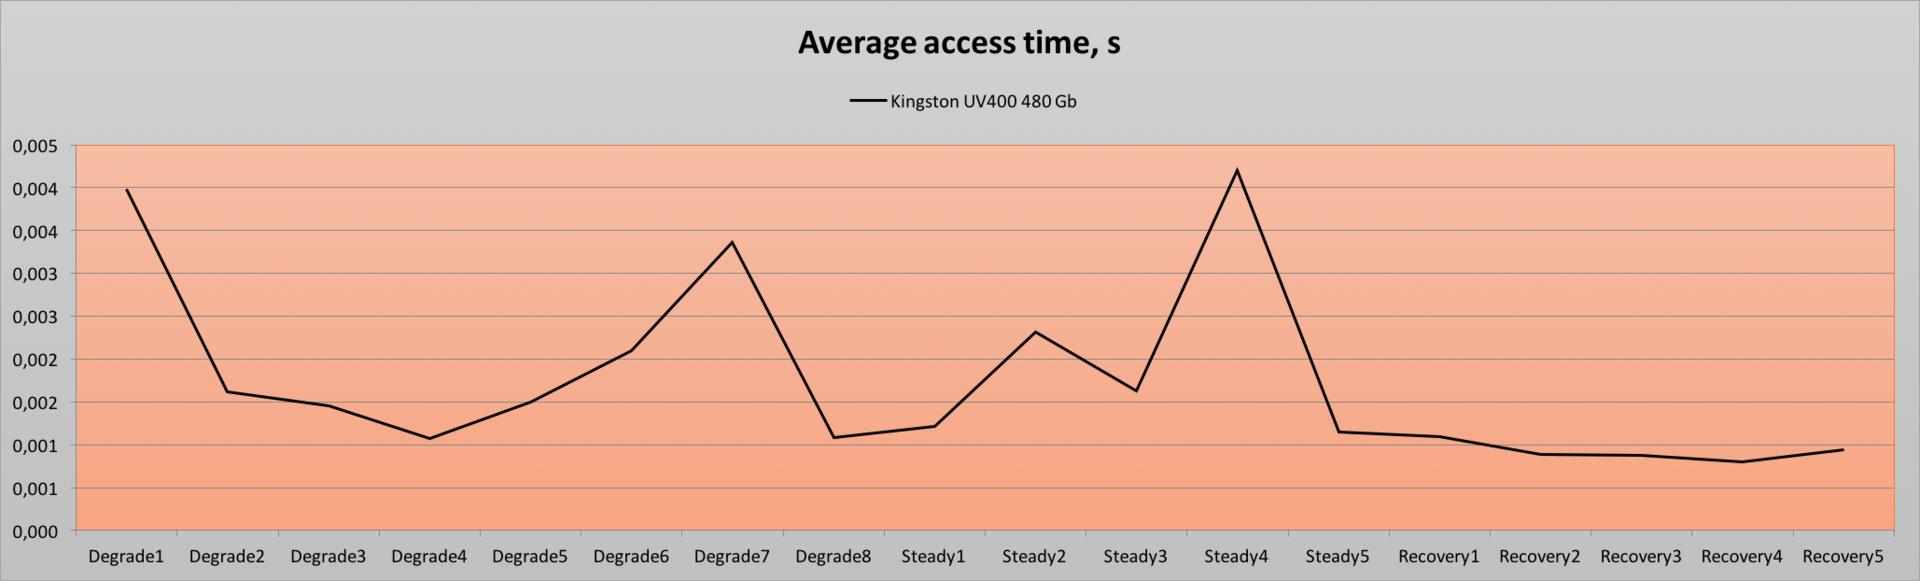 Обзор твердотельного накопителя Kingston UV400 480 Gb — SSD с «изюмом» - 15